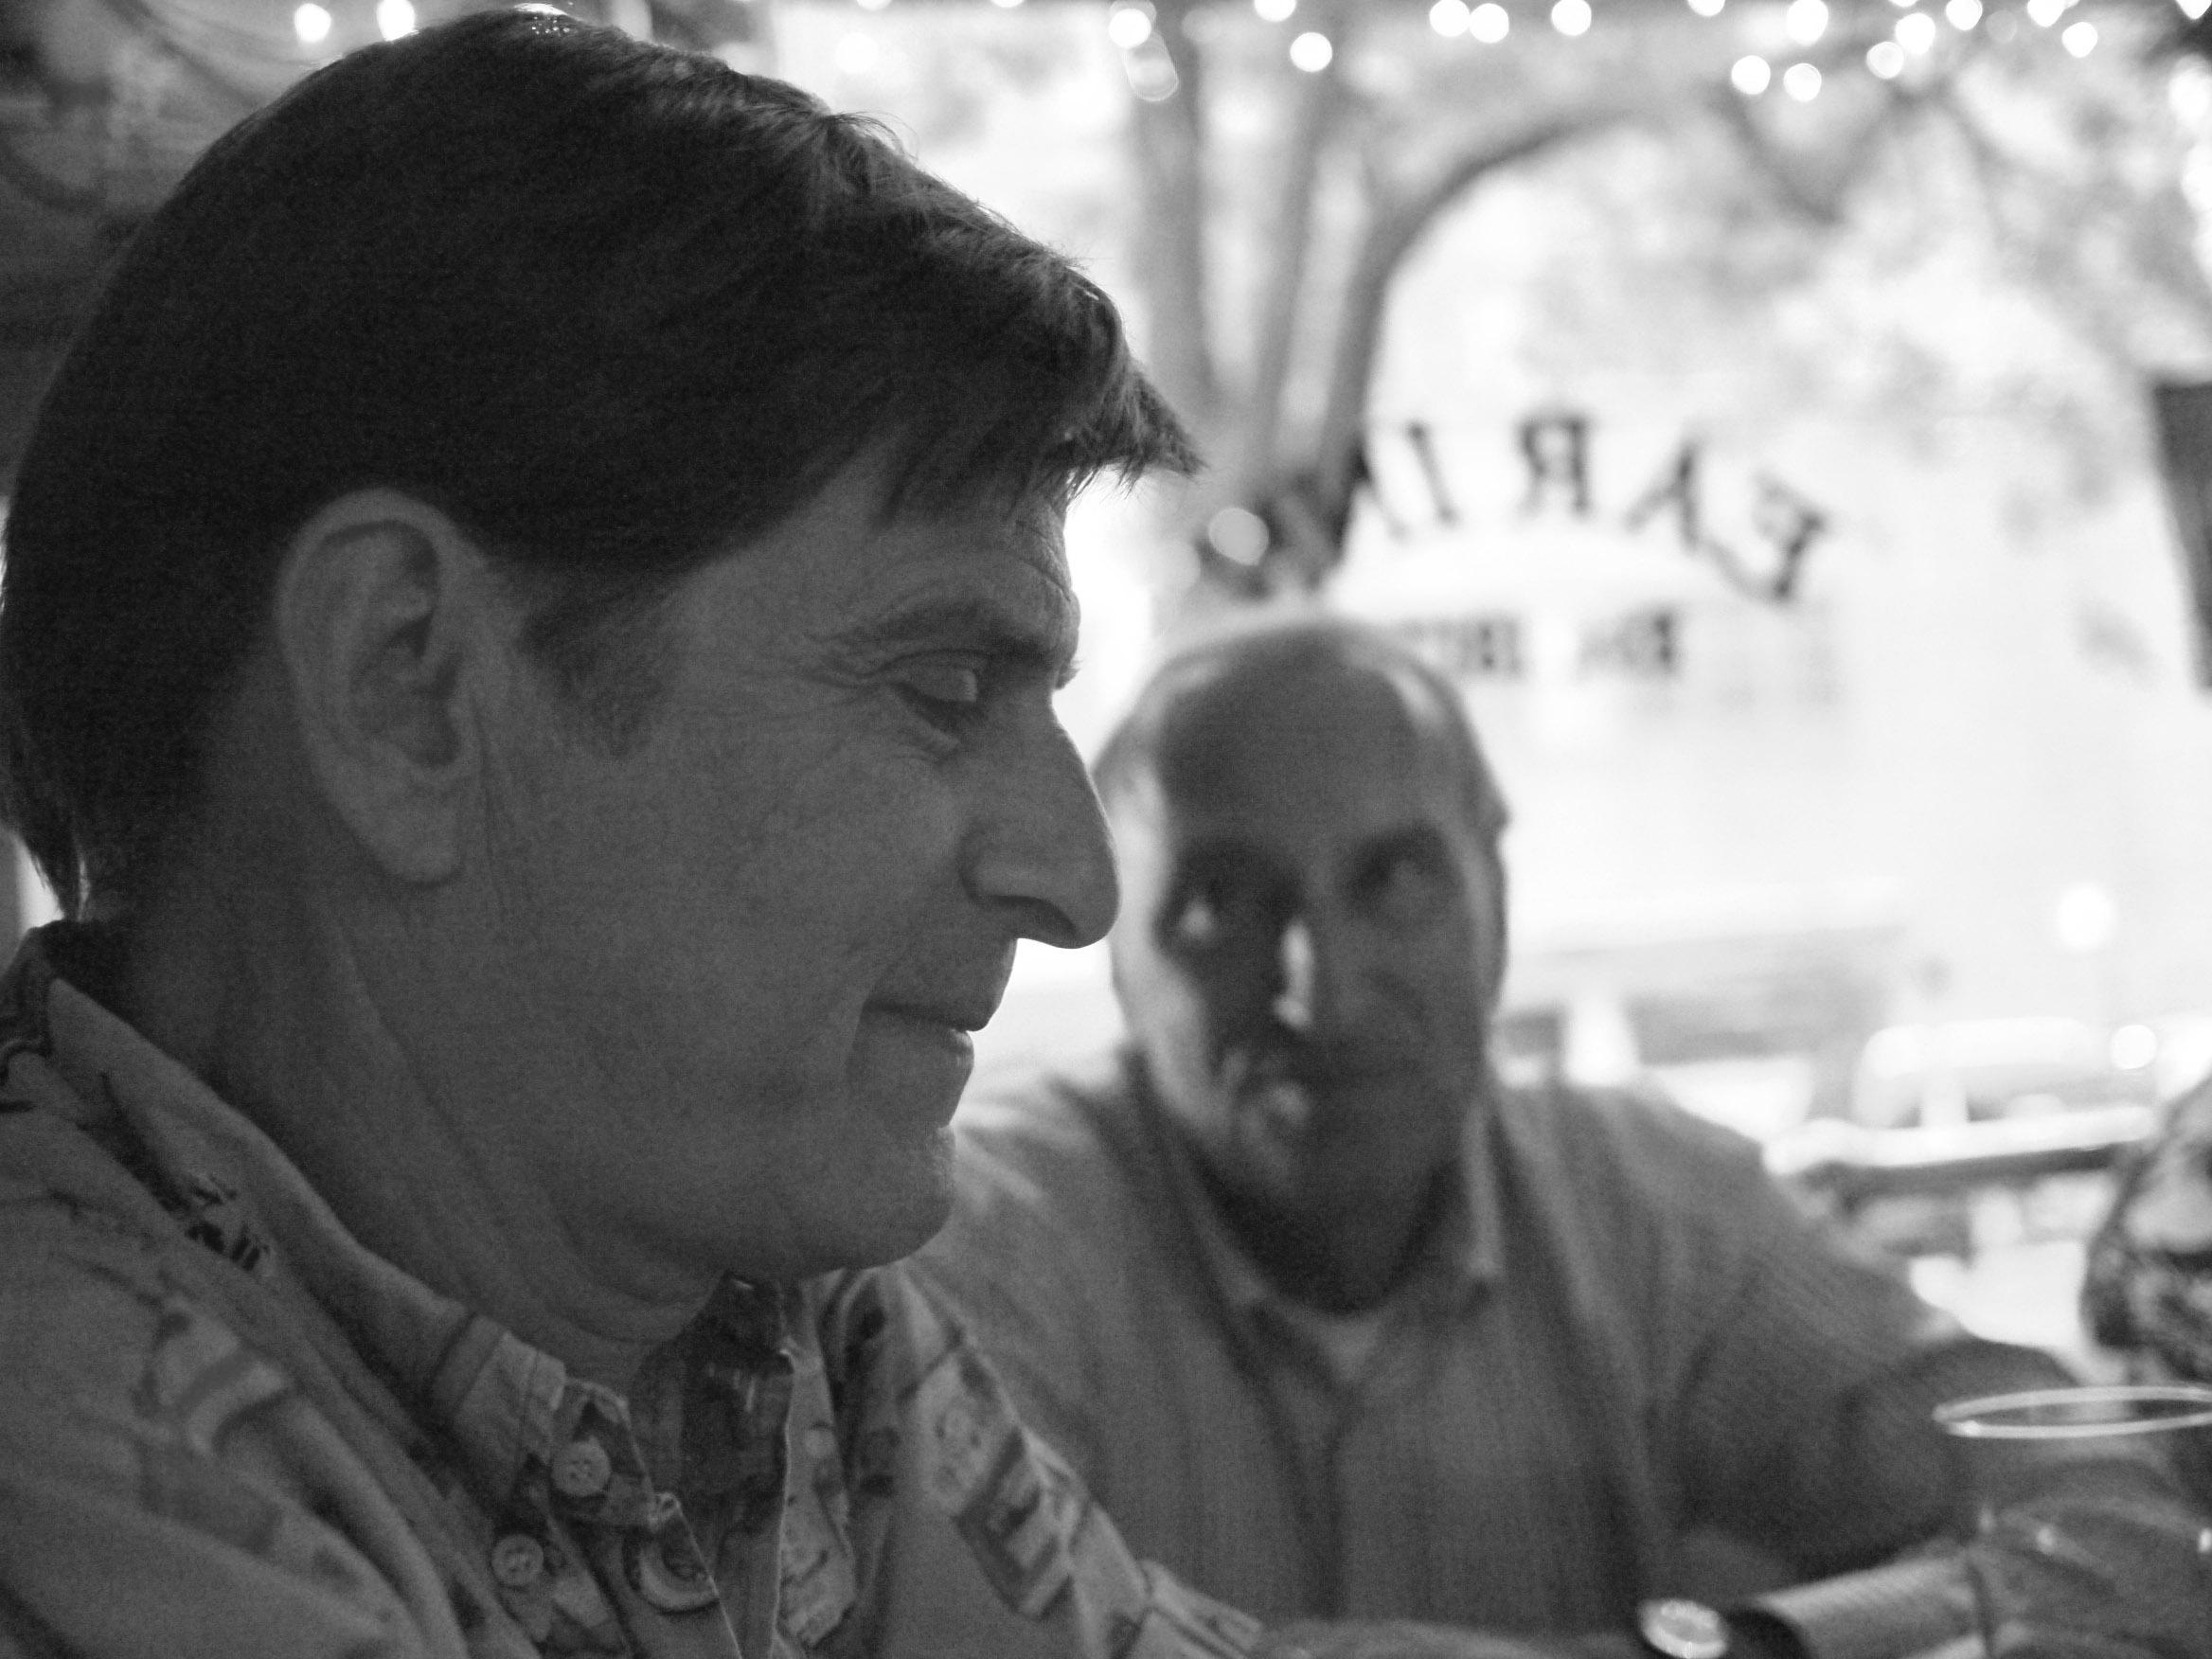 Photo of Paul and Peer at the Ear Inn